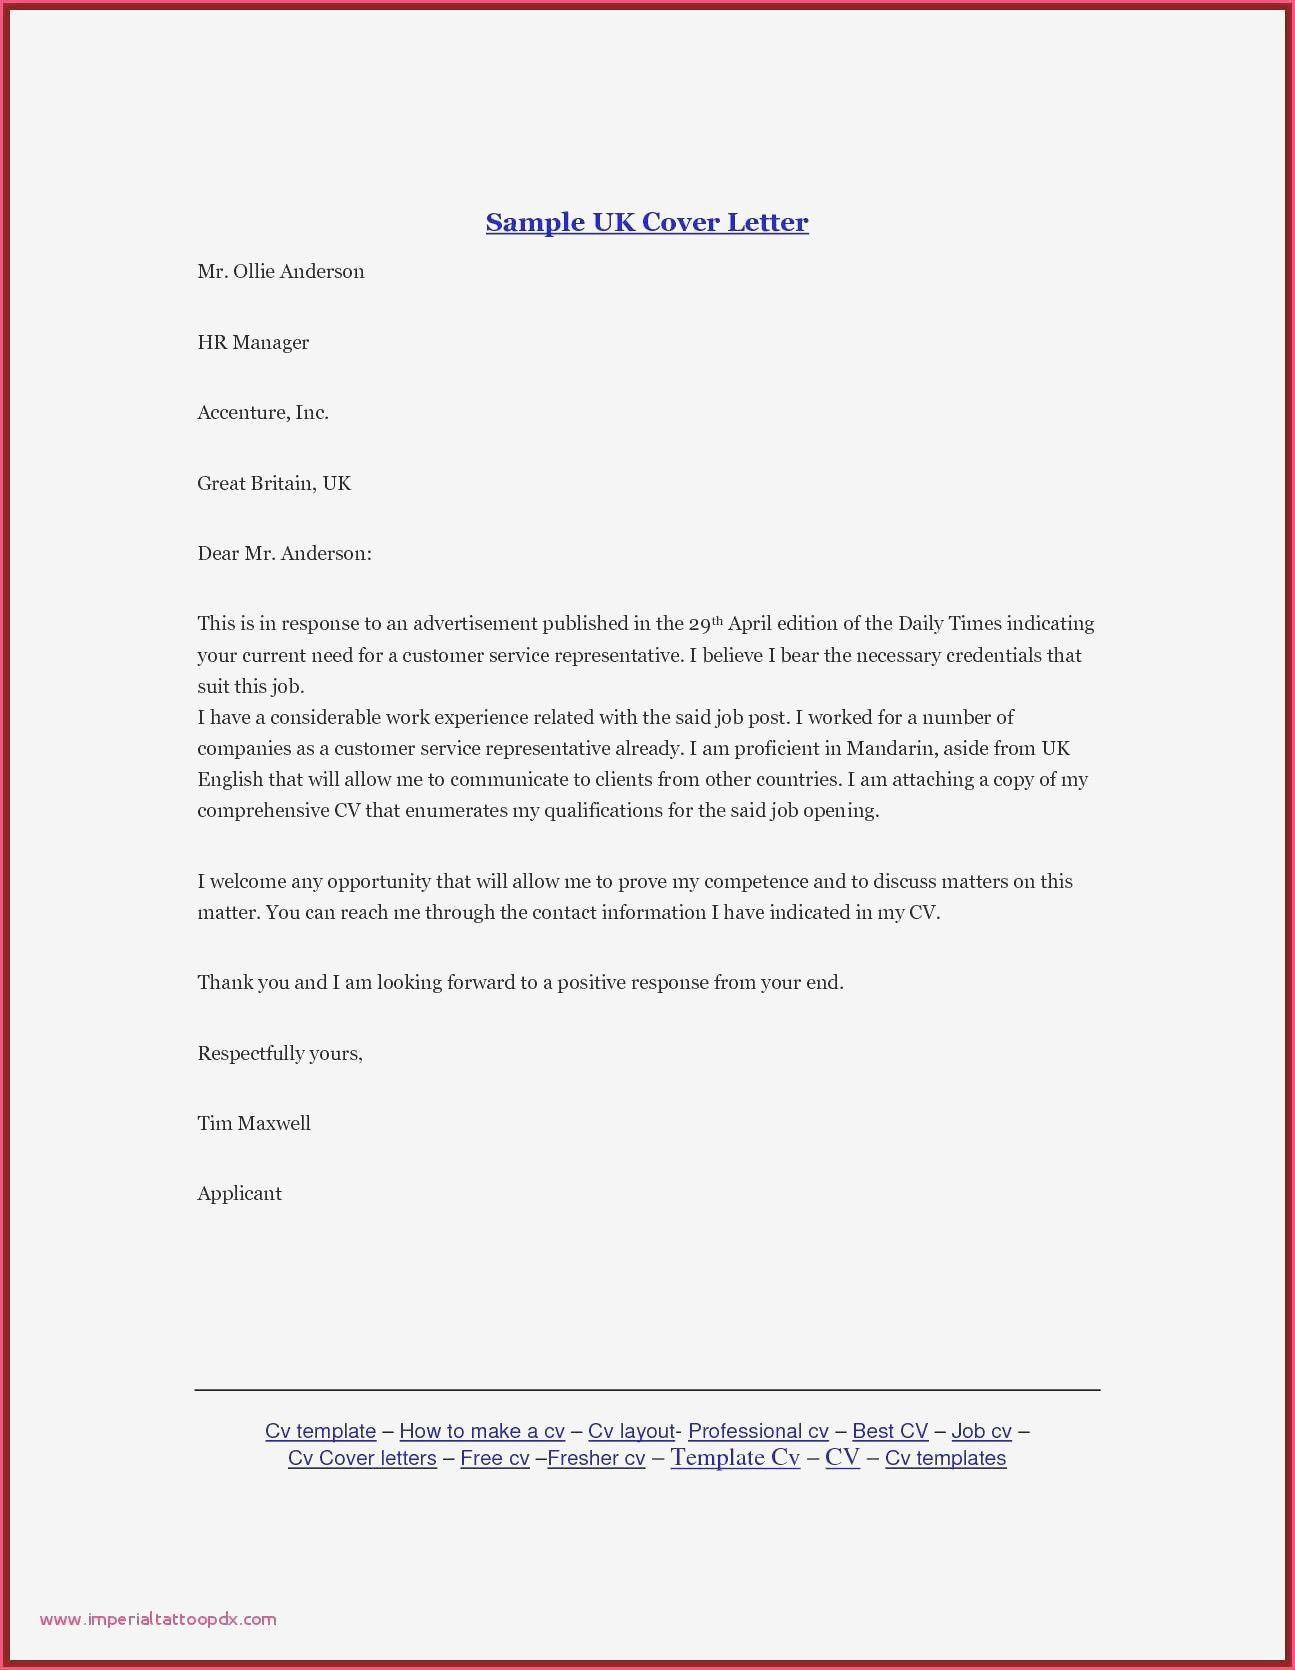 Inspirational Sample Introduction Letter For Job Job Cover